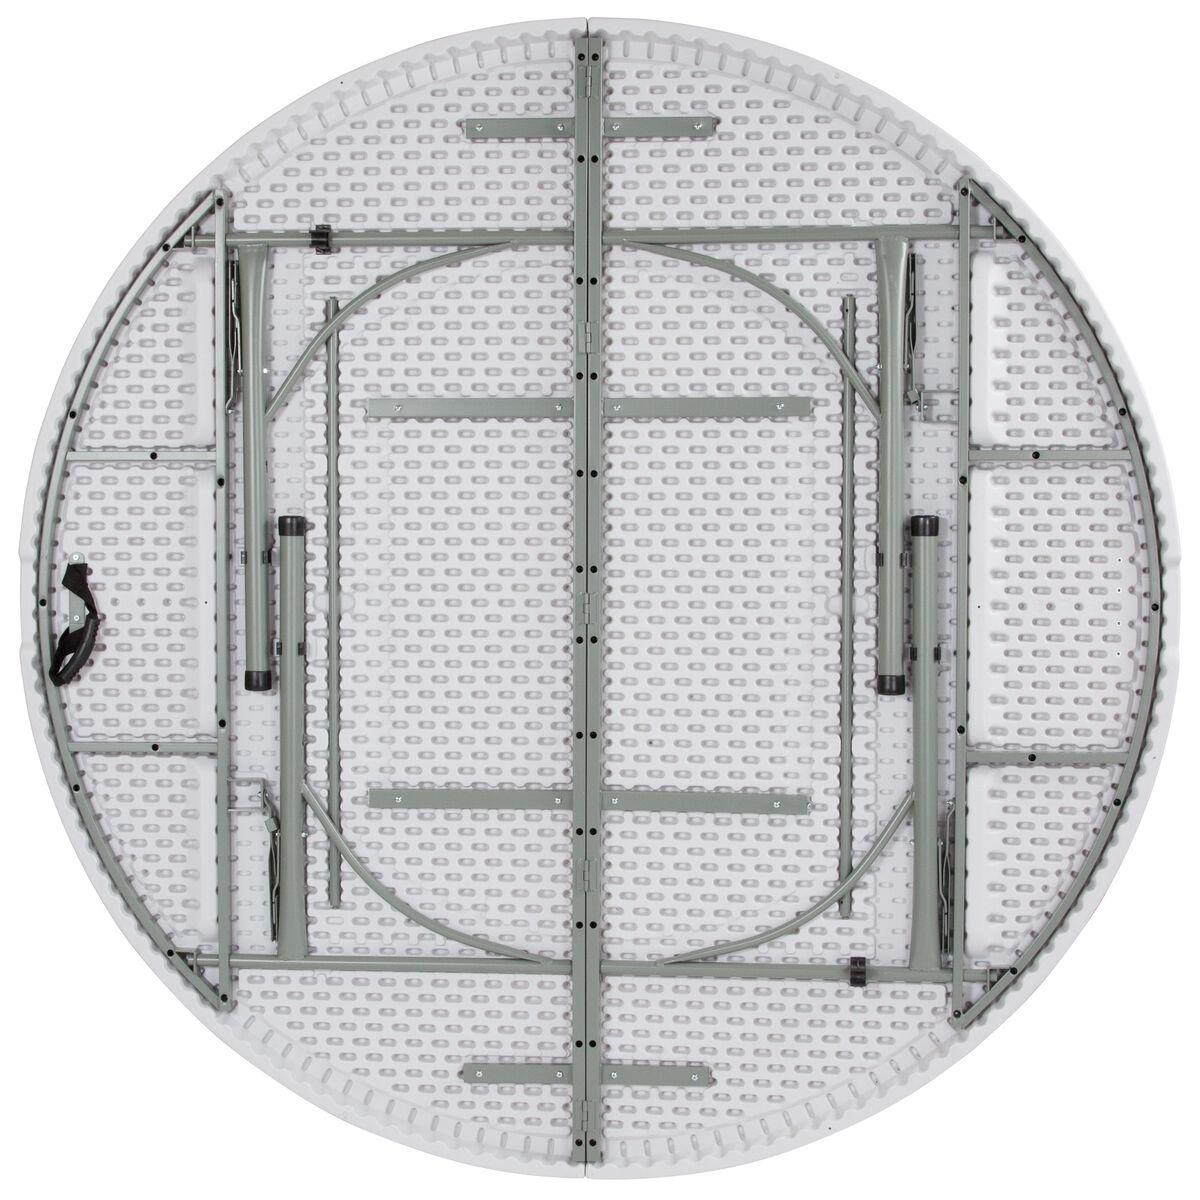 72rd white bi fold table dad 183rz gg foldingchairs4less com